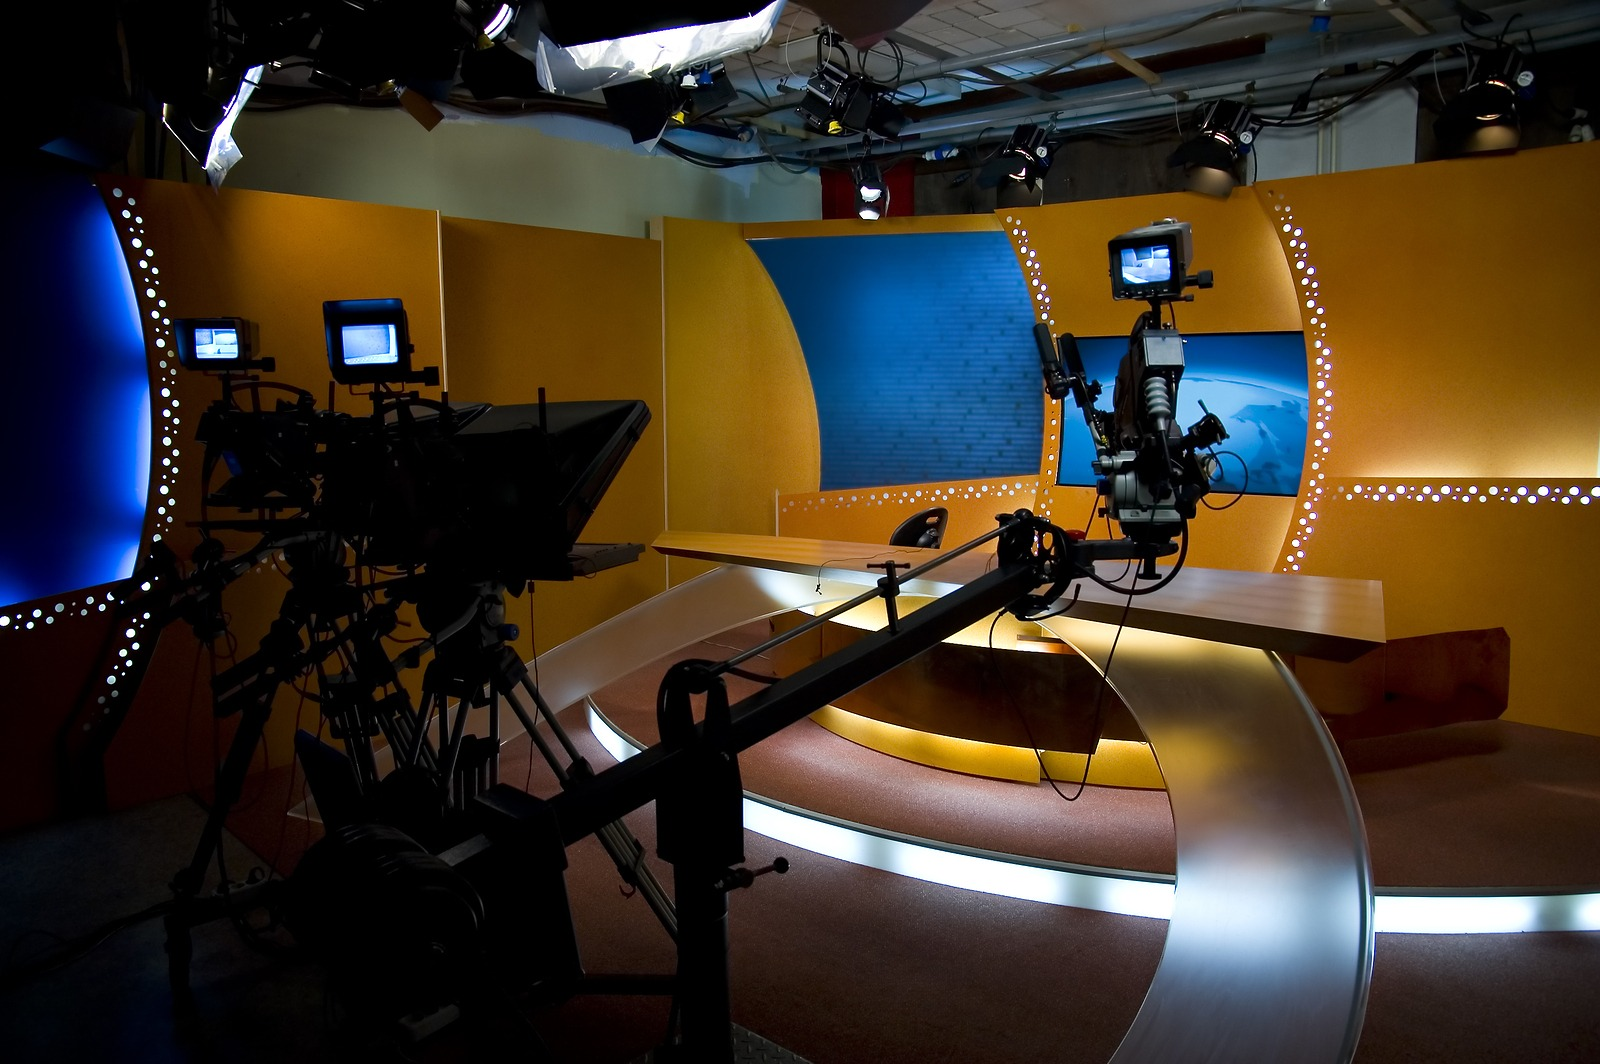 bigstock-Tv-Studio-And-Lights-2336019